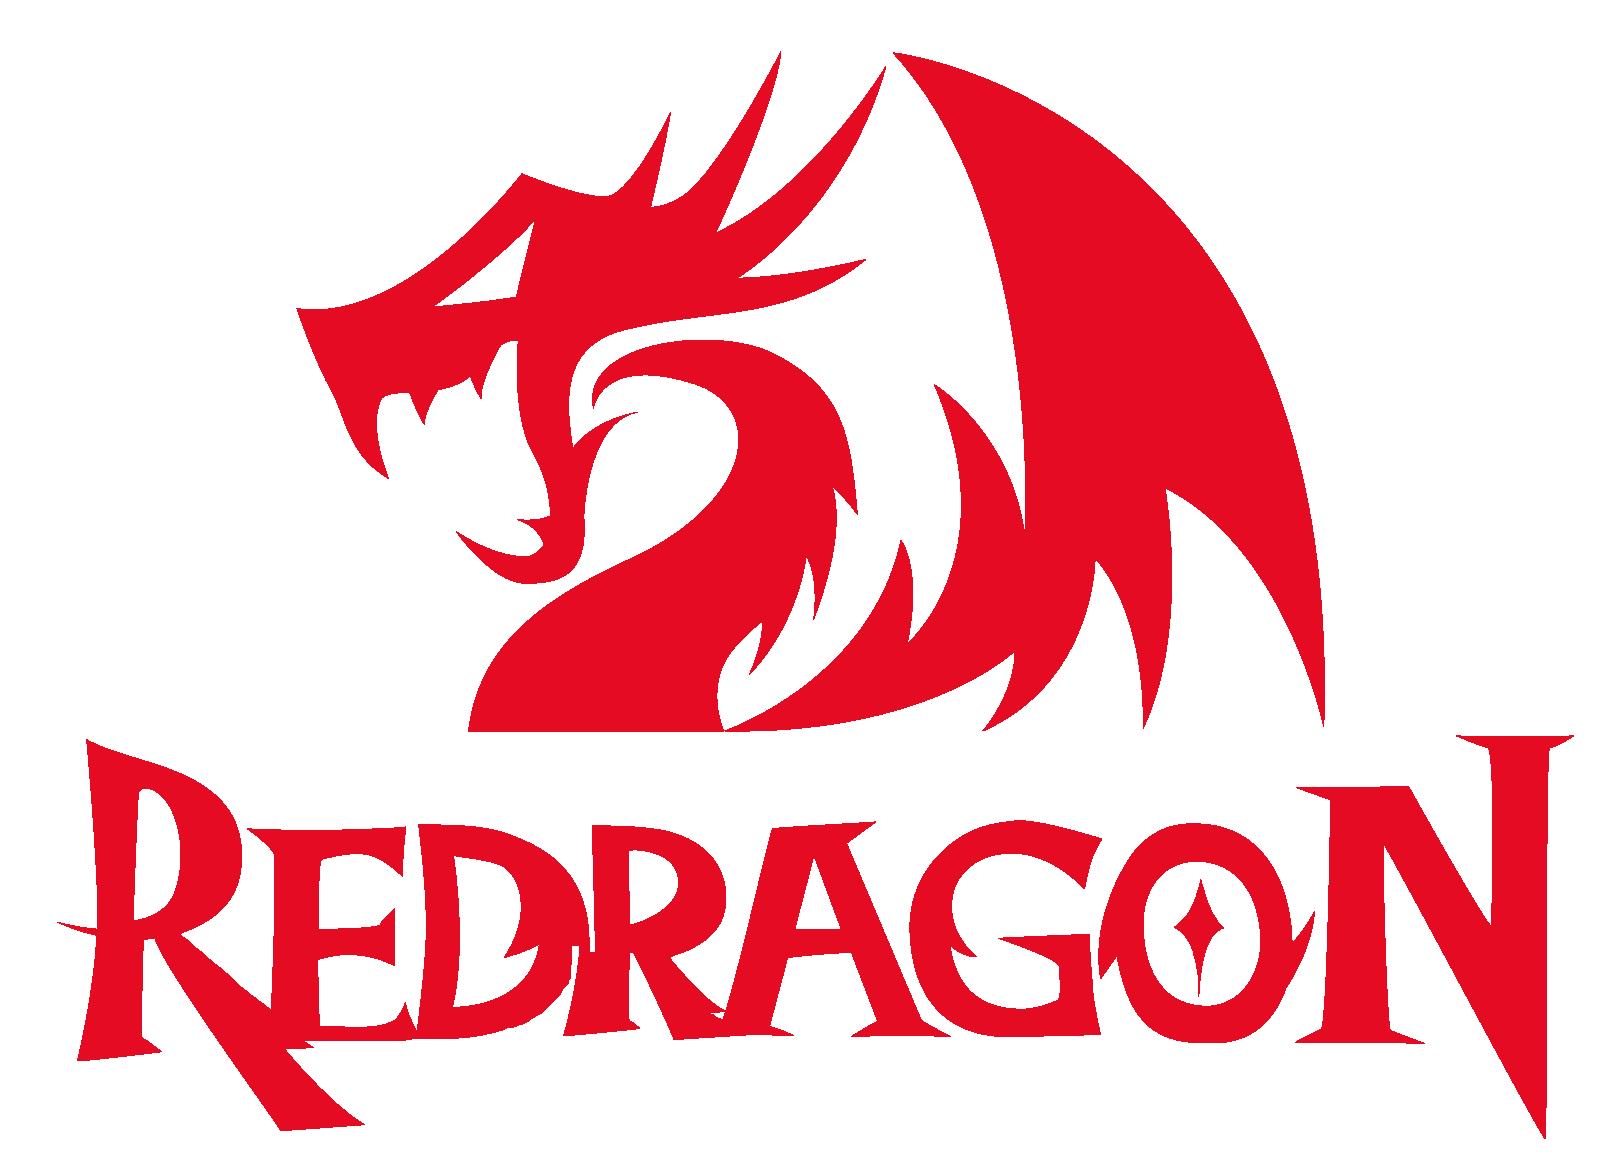 redragon-01